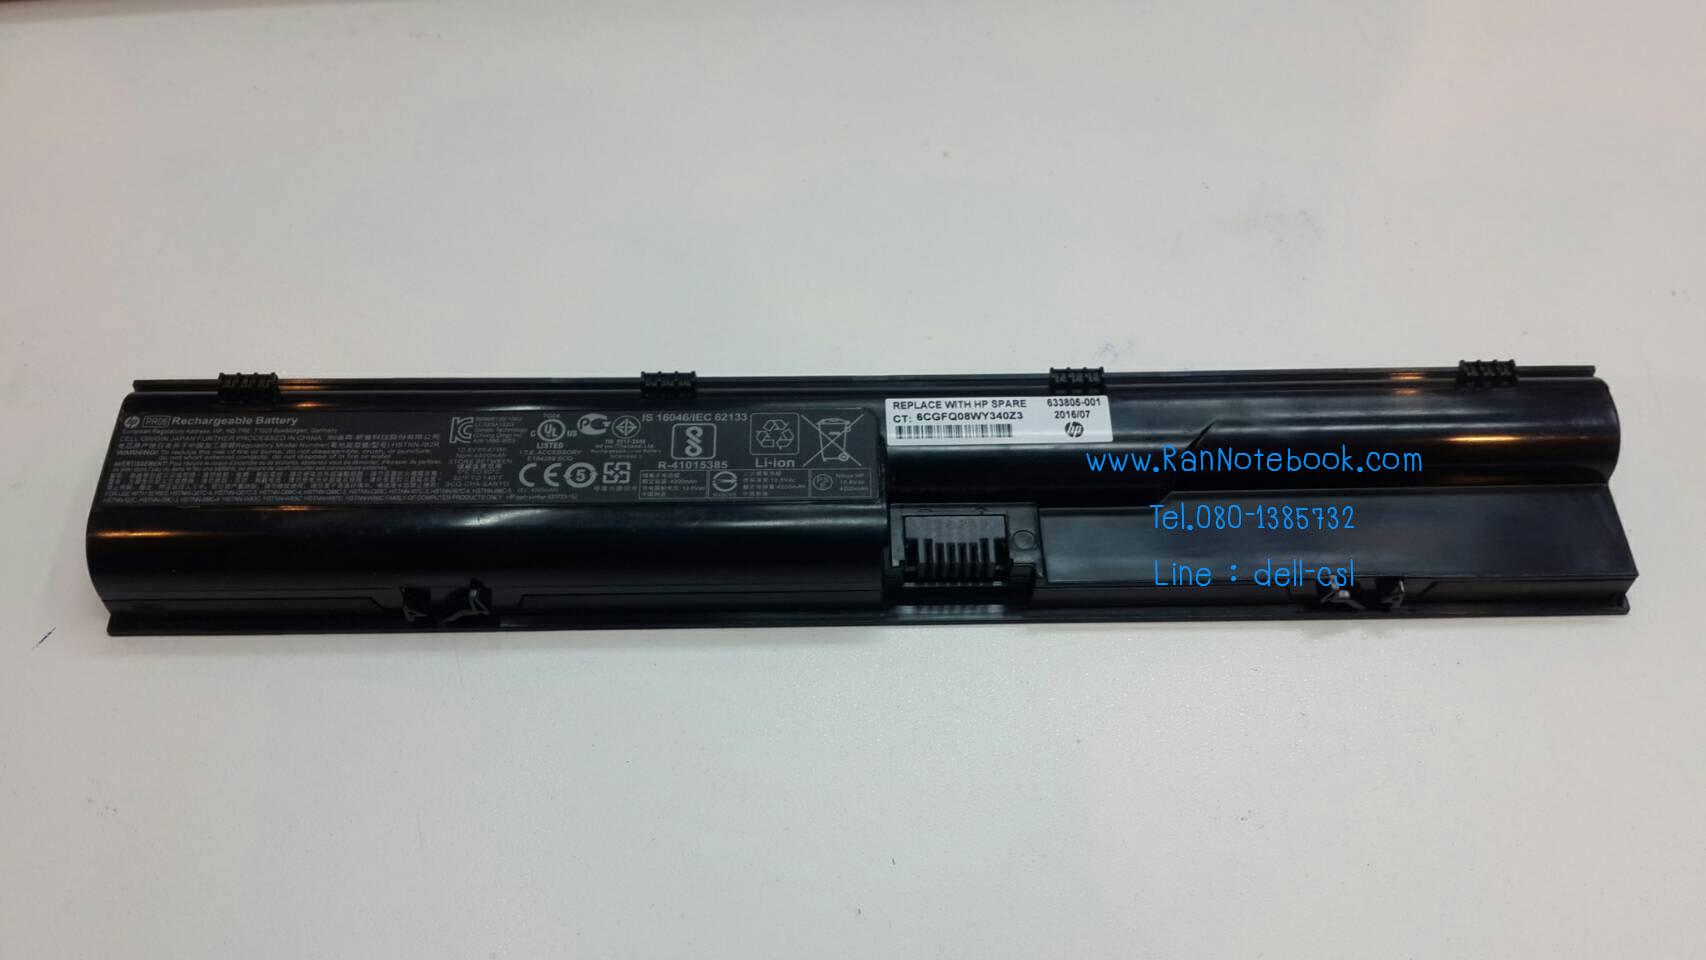 Battery HP แท้ ประกันศูนย์ 1 ปี Probook 4440s 4441s 4445s 4446s 5353s 4435s 4436s 4530s 4545s 4540s 4330s 4430s 4431s 4331s ราคา ไม่แพง